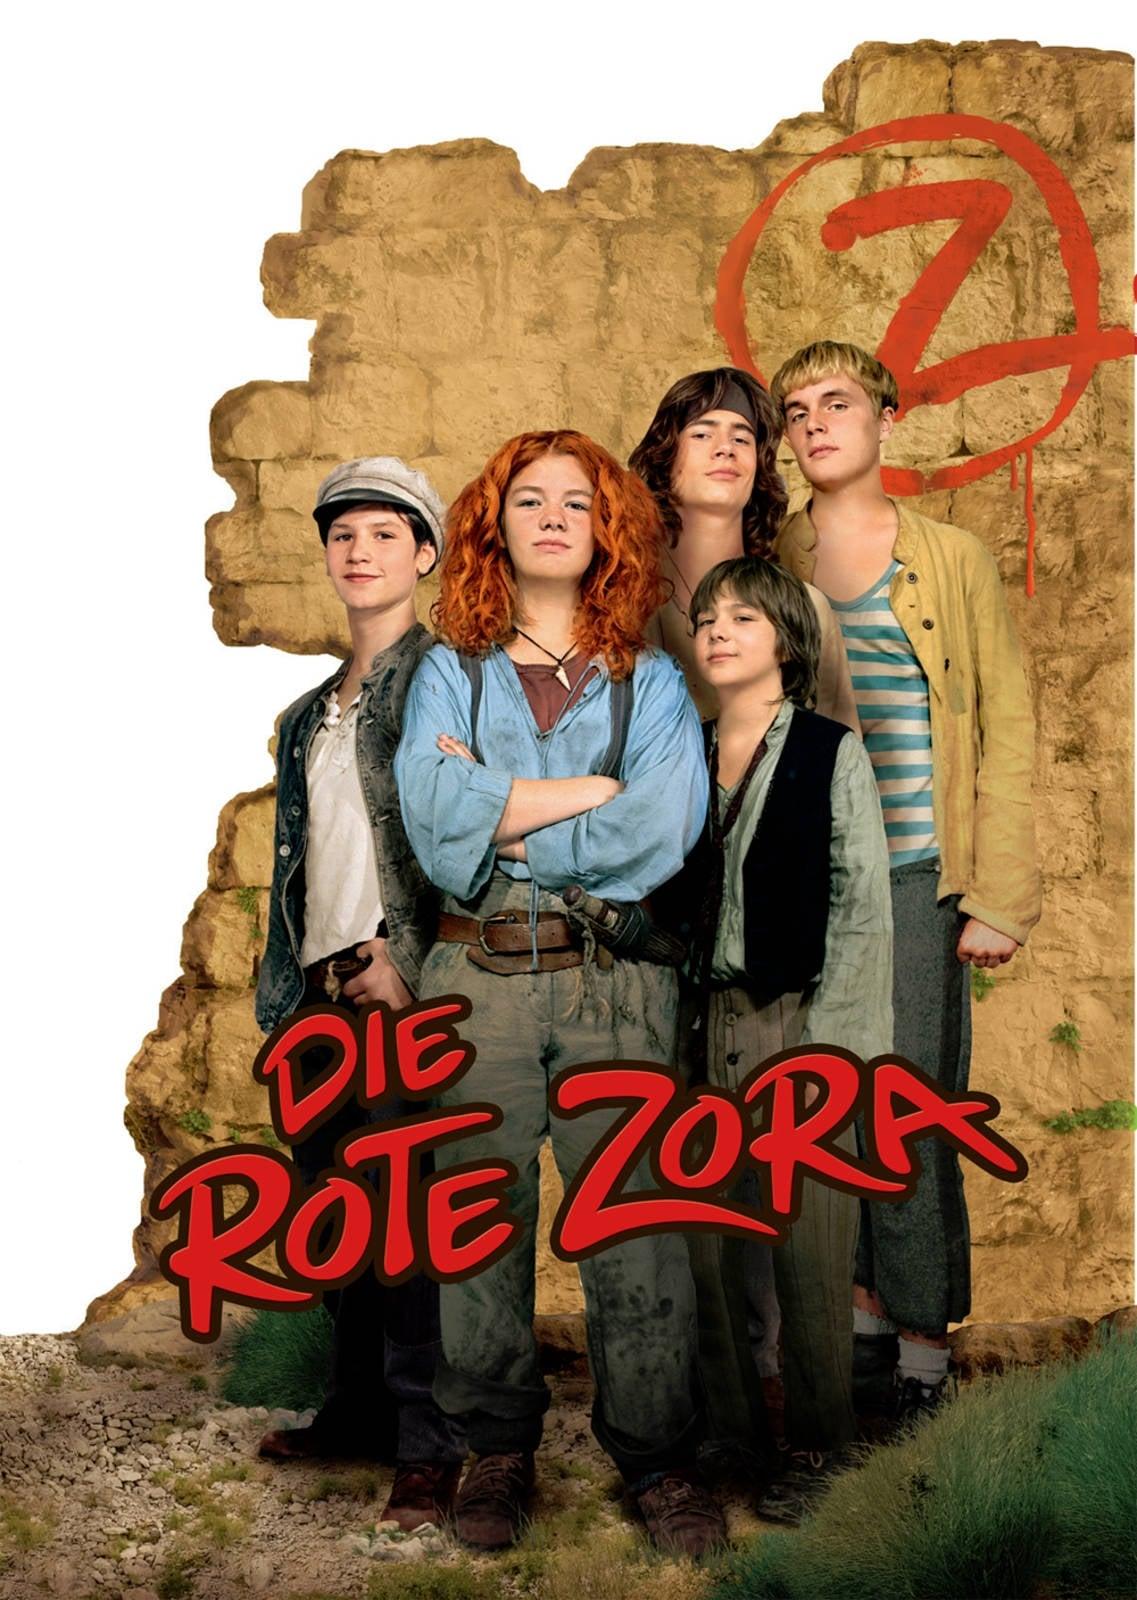 Red Zora